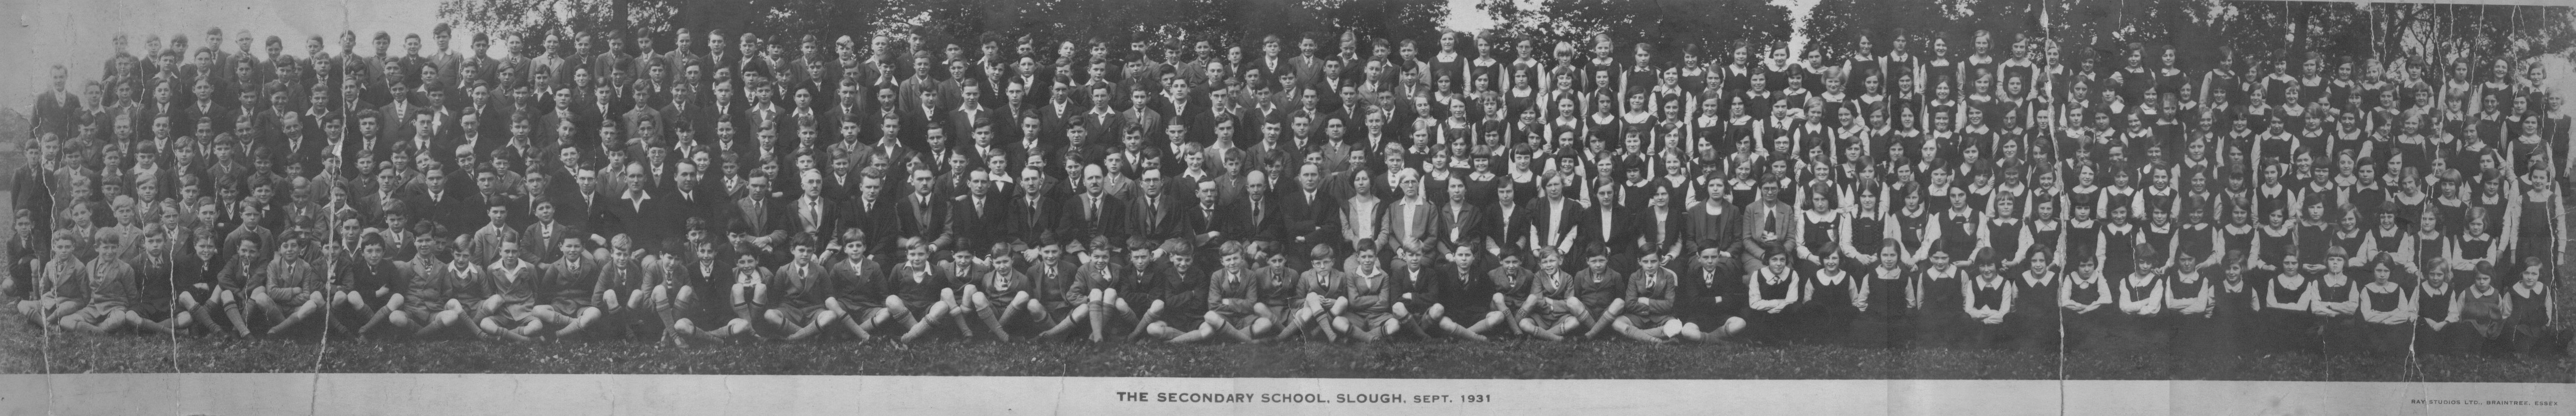 Slough Secondary School. 1931